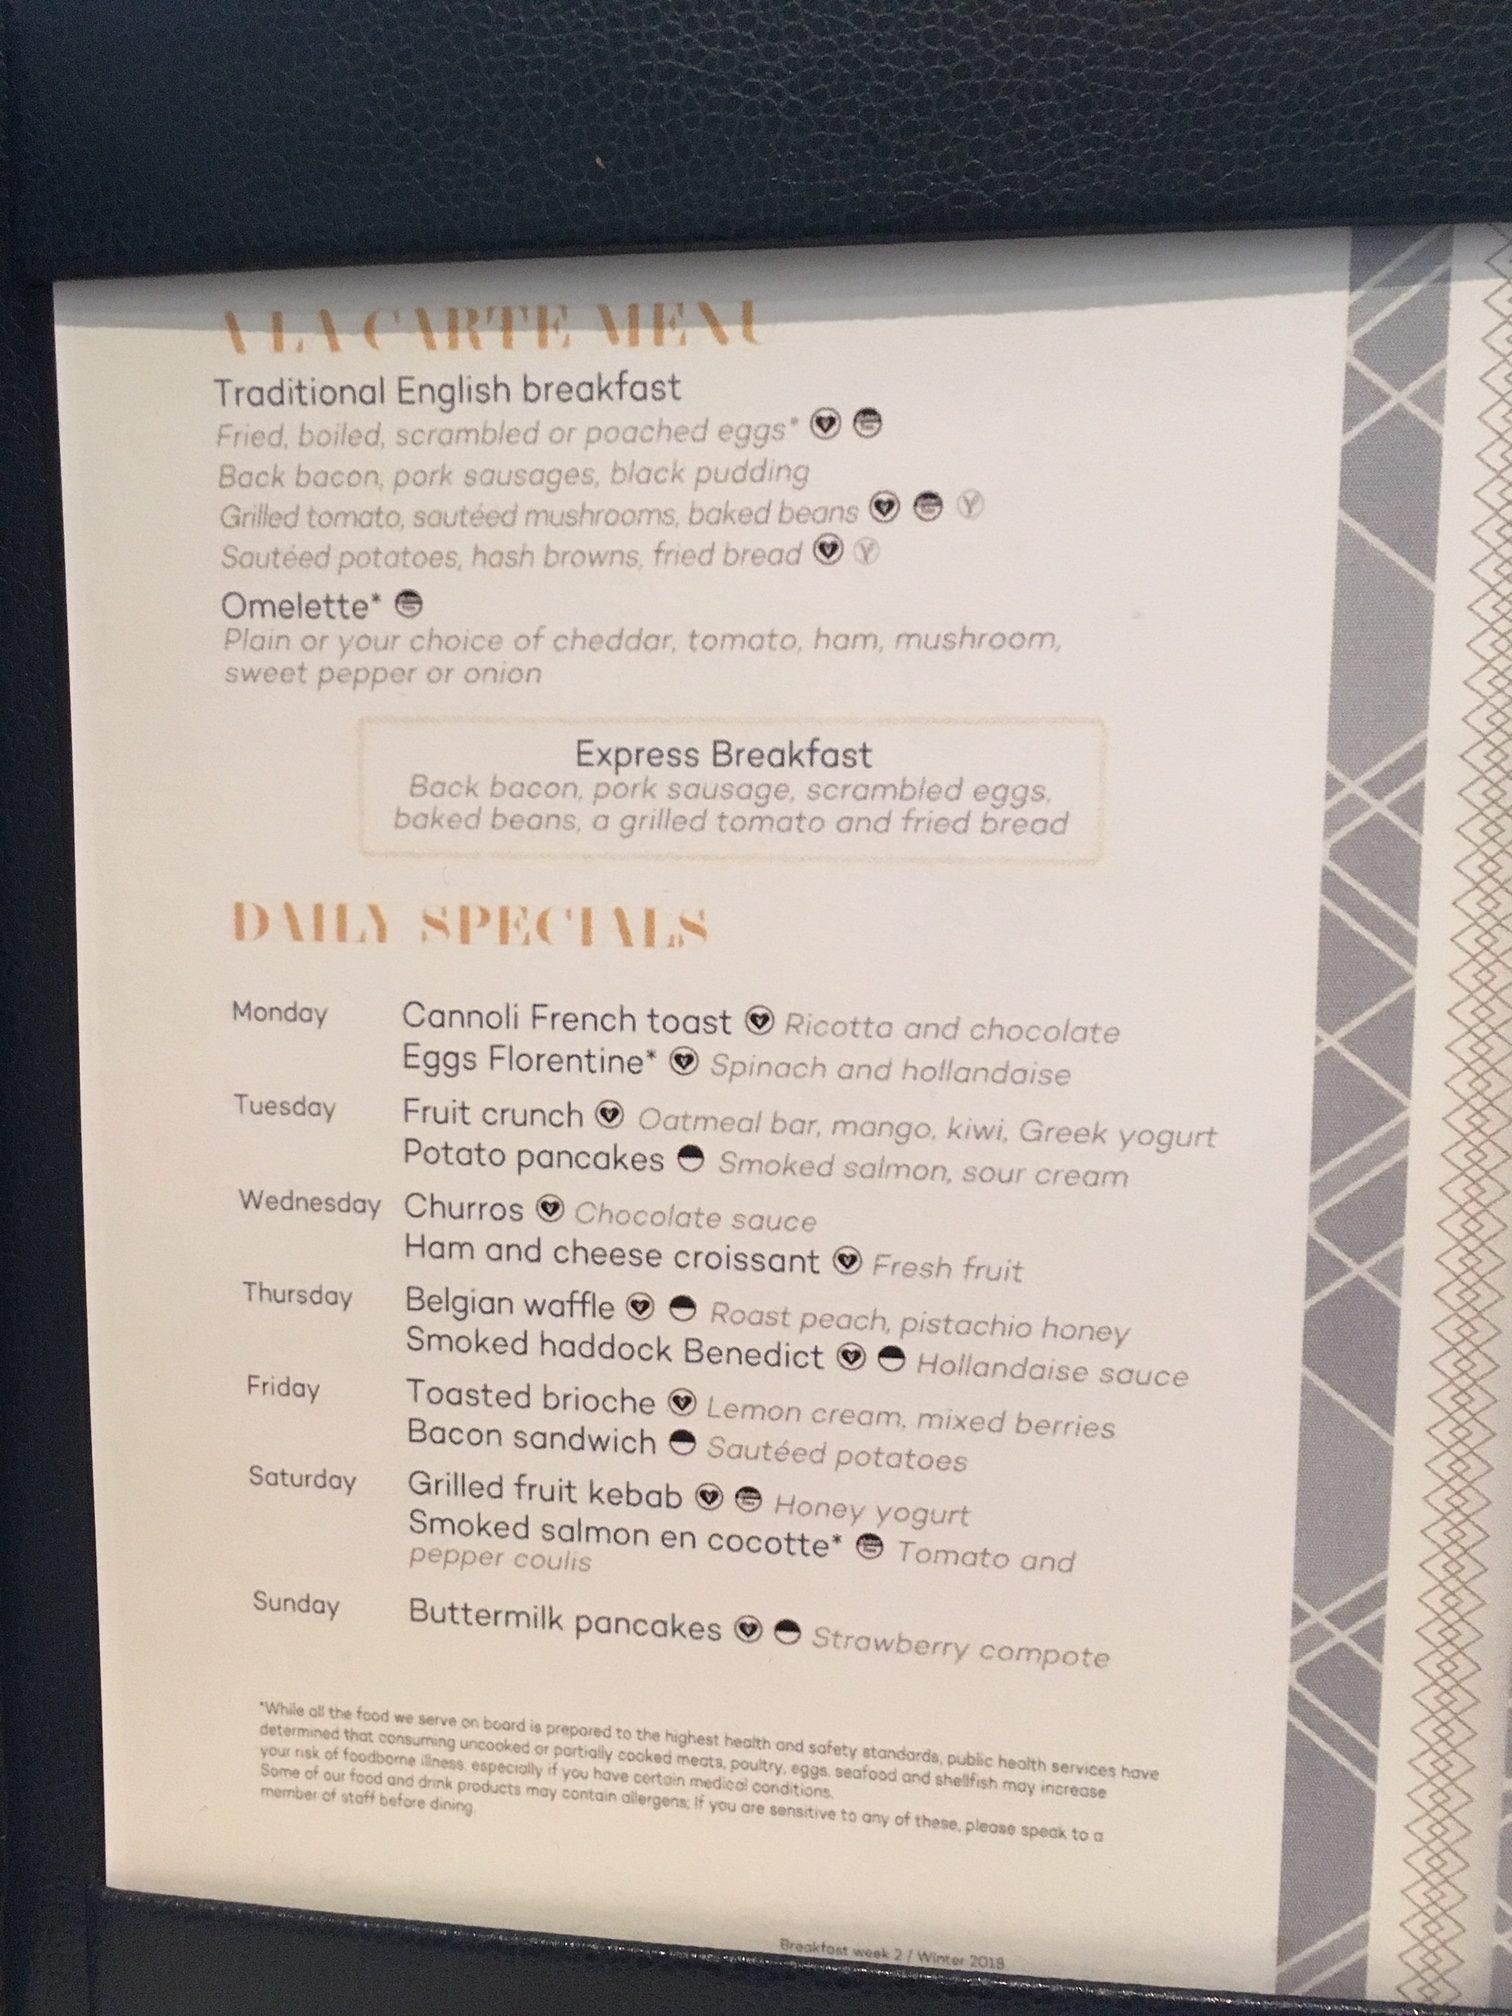 Marella MDR breakfast menu